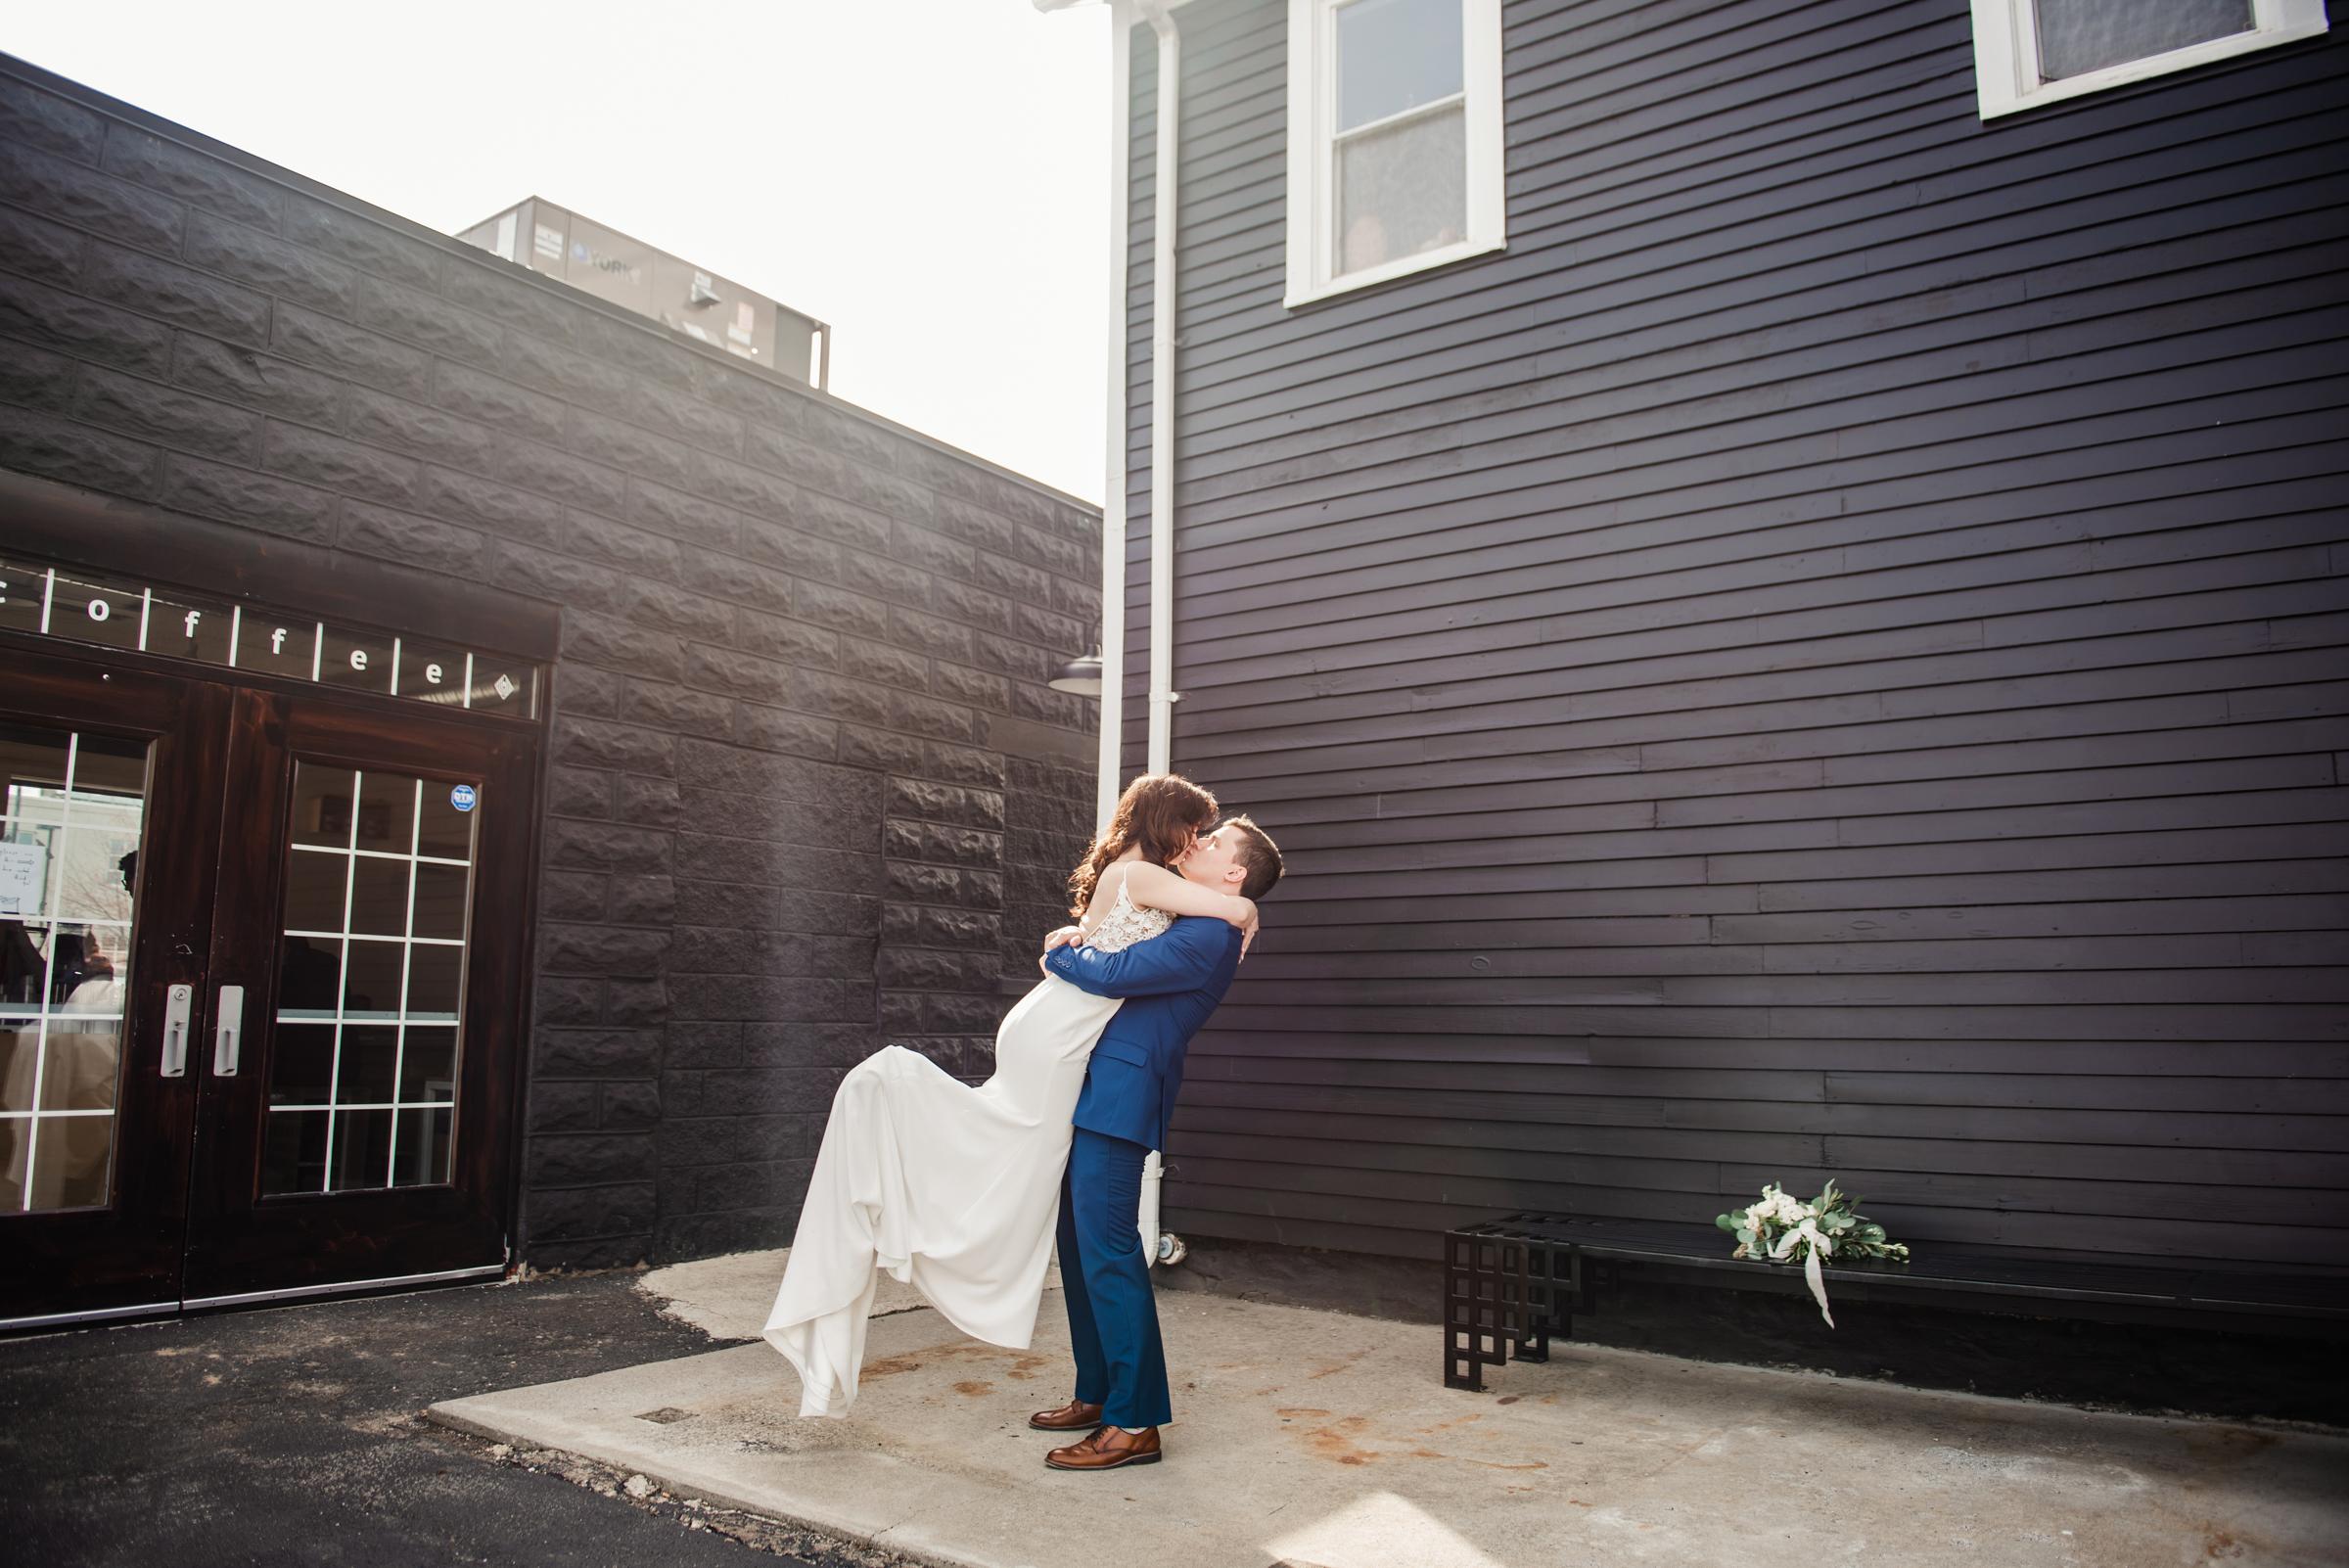 The_Arbor_LoftRochester_Wedding_JILL_STUDIO_Rochester_NY_Photographer_155917.jpg